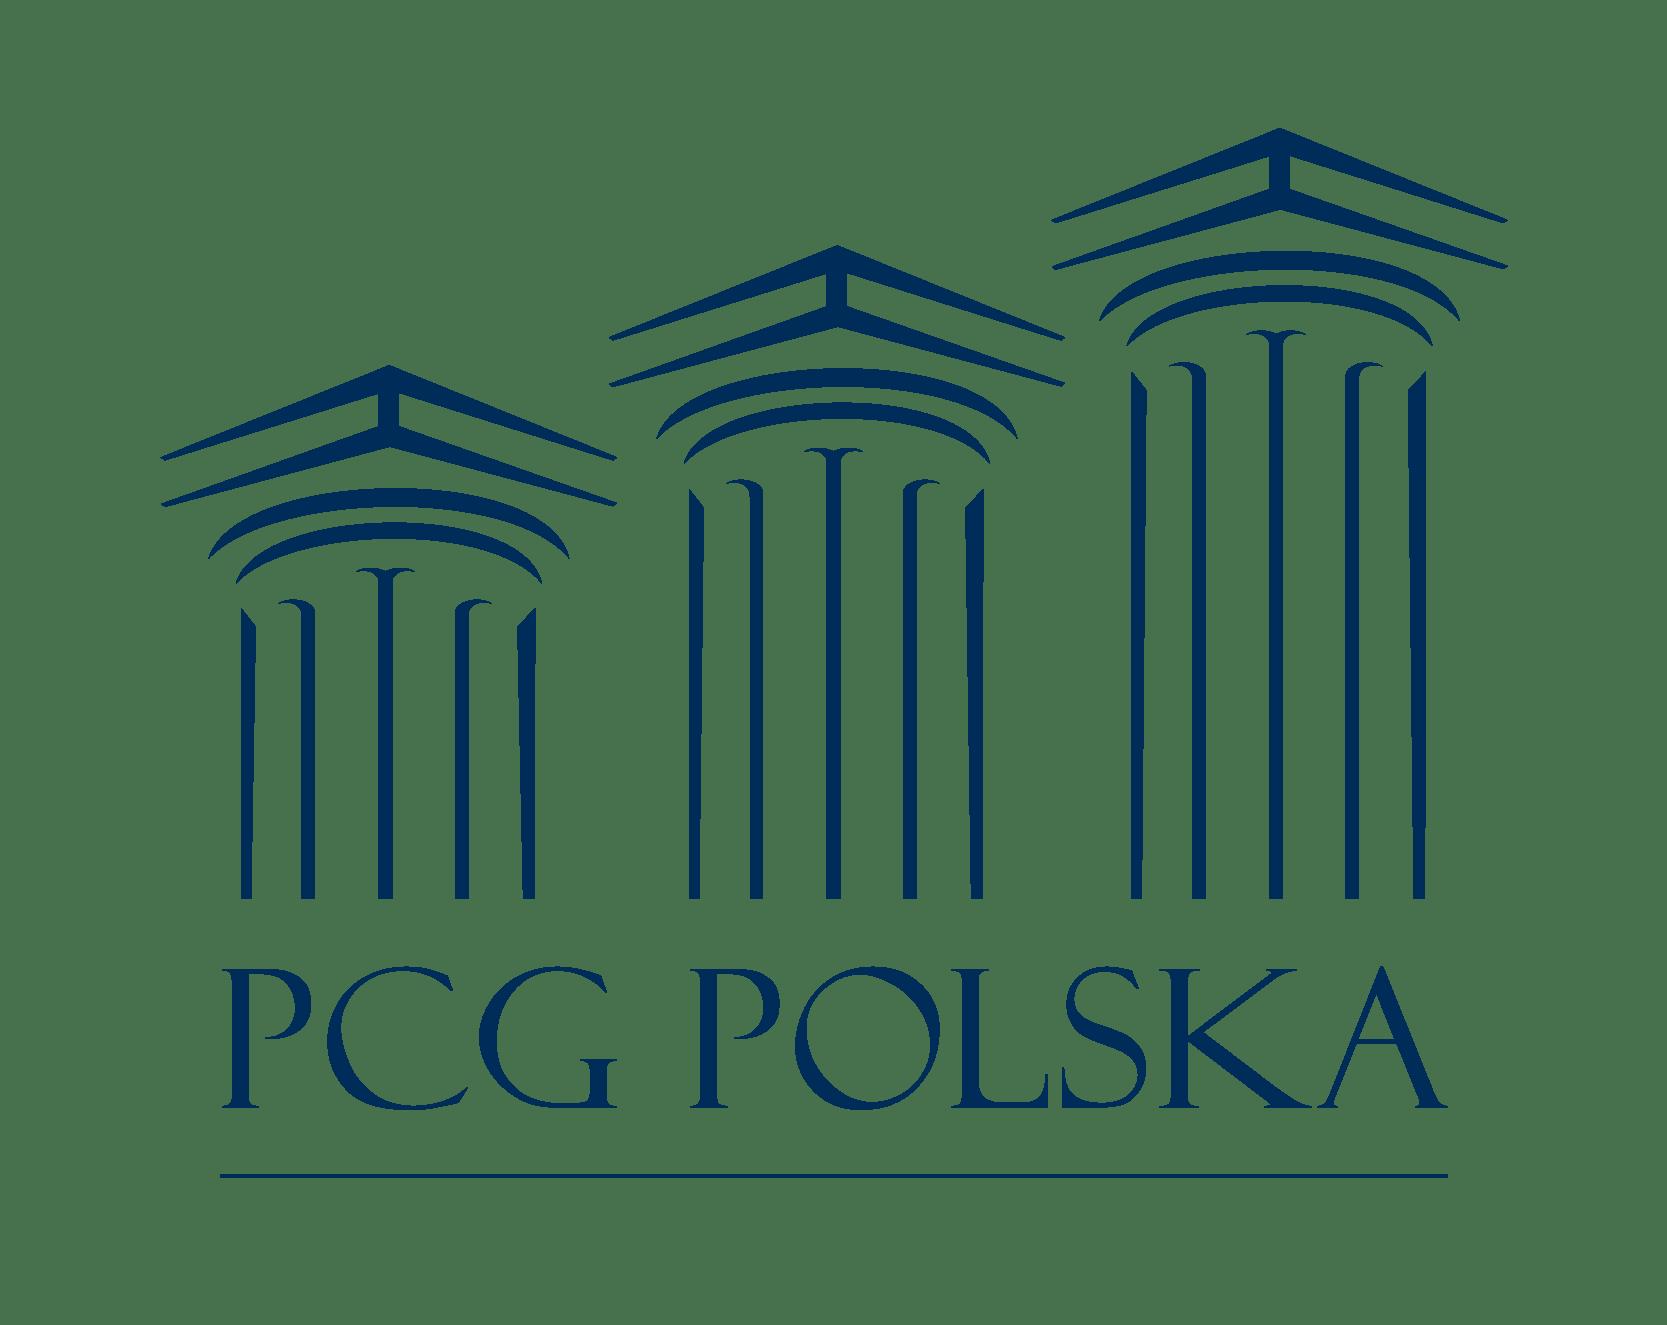 PCG POLSKA